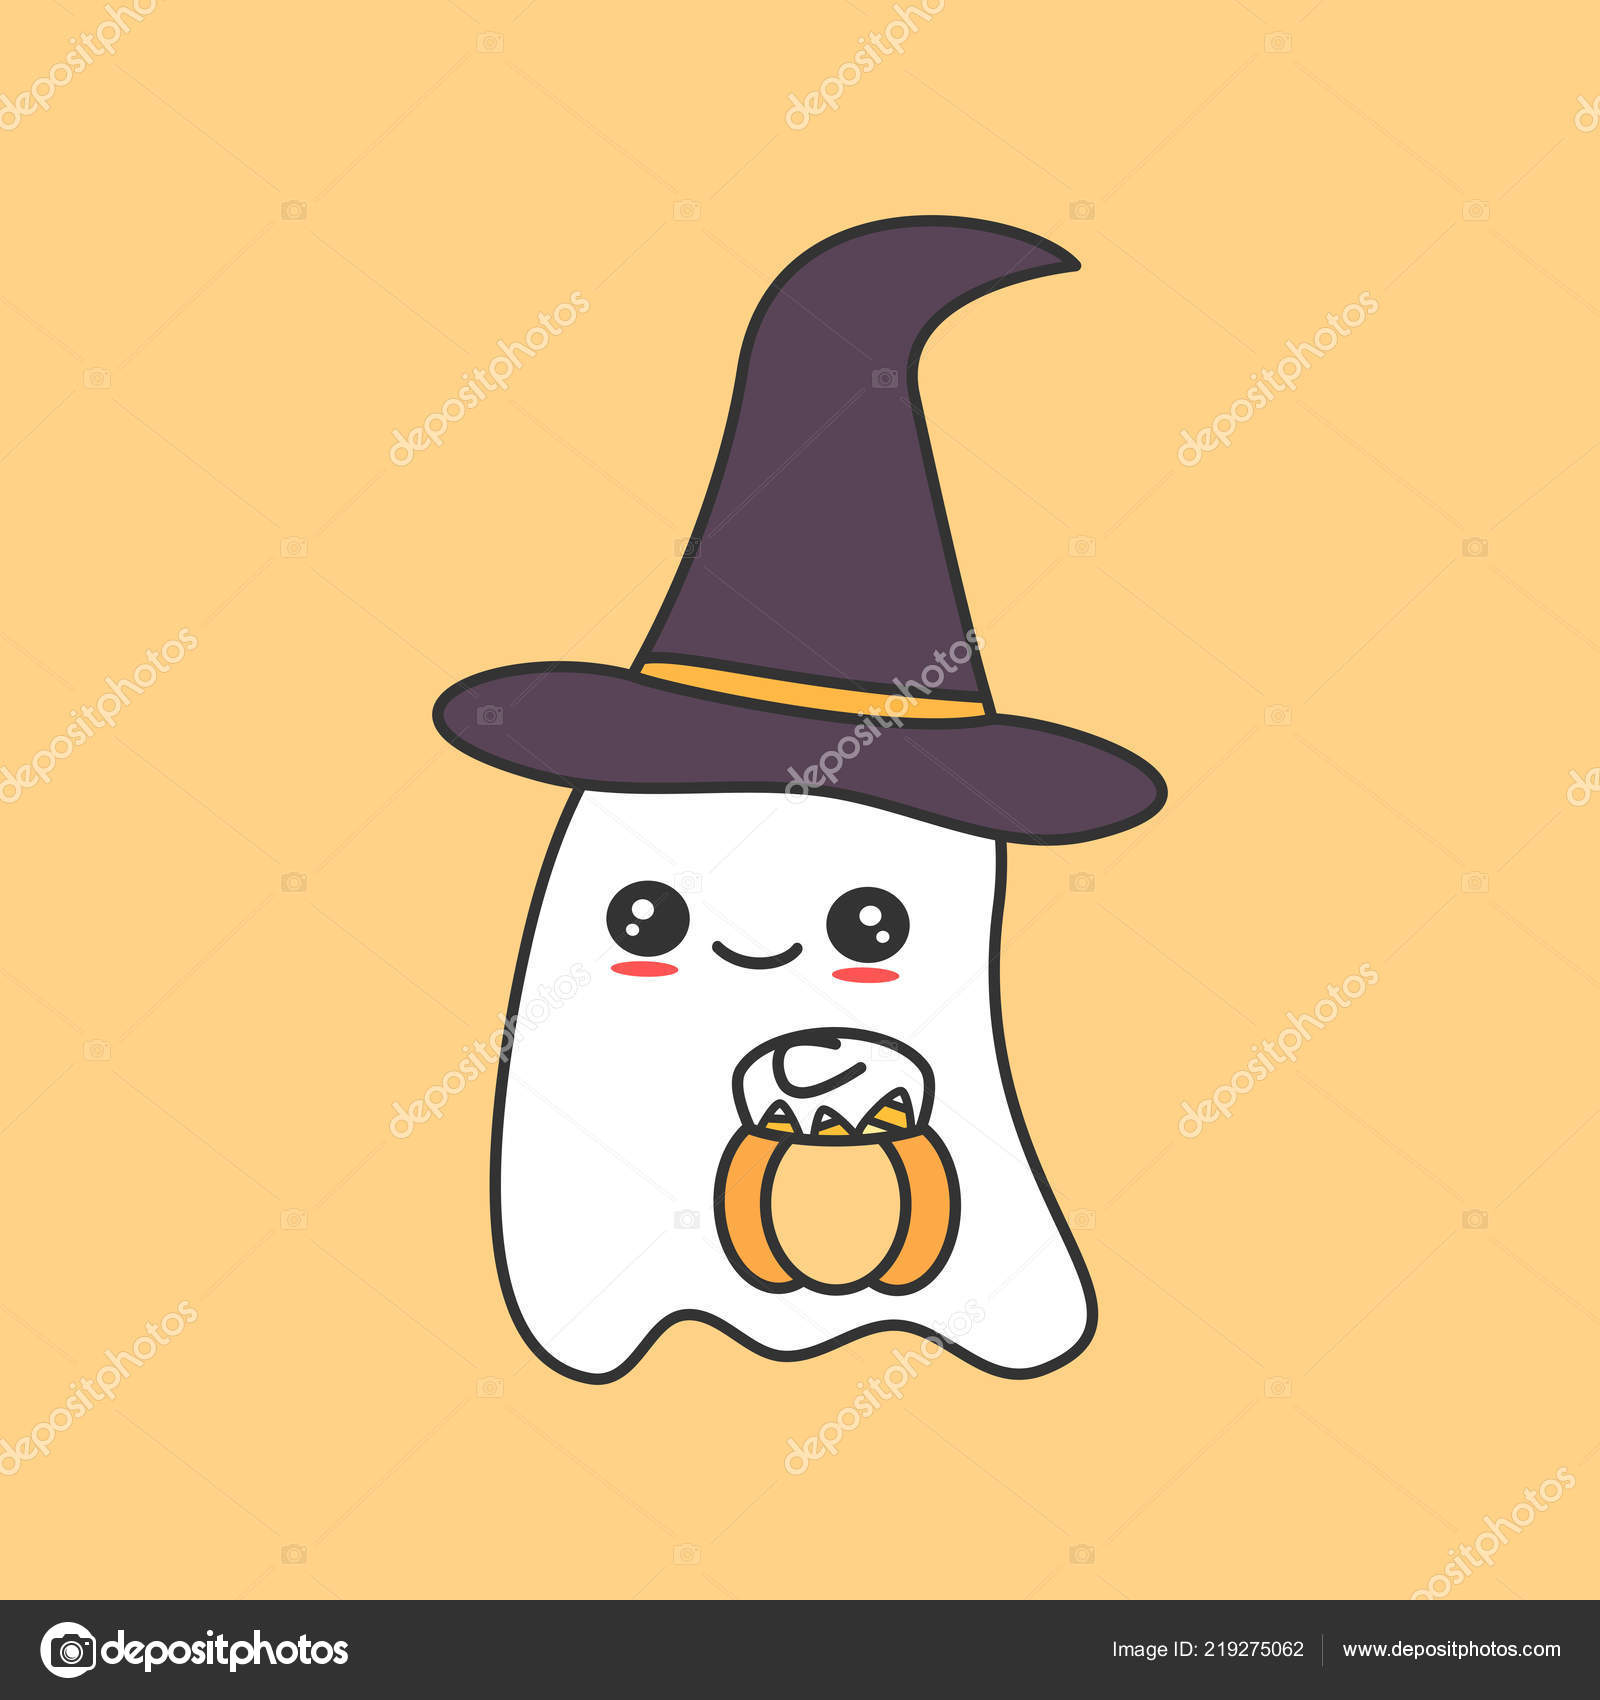 Cute Cartoon Ghost Pumpkin Funny Vector Halloween